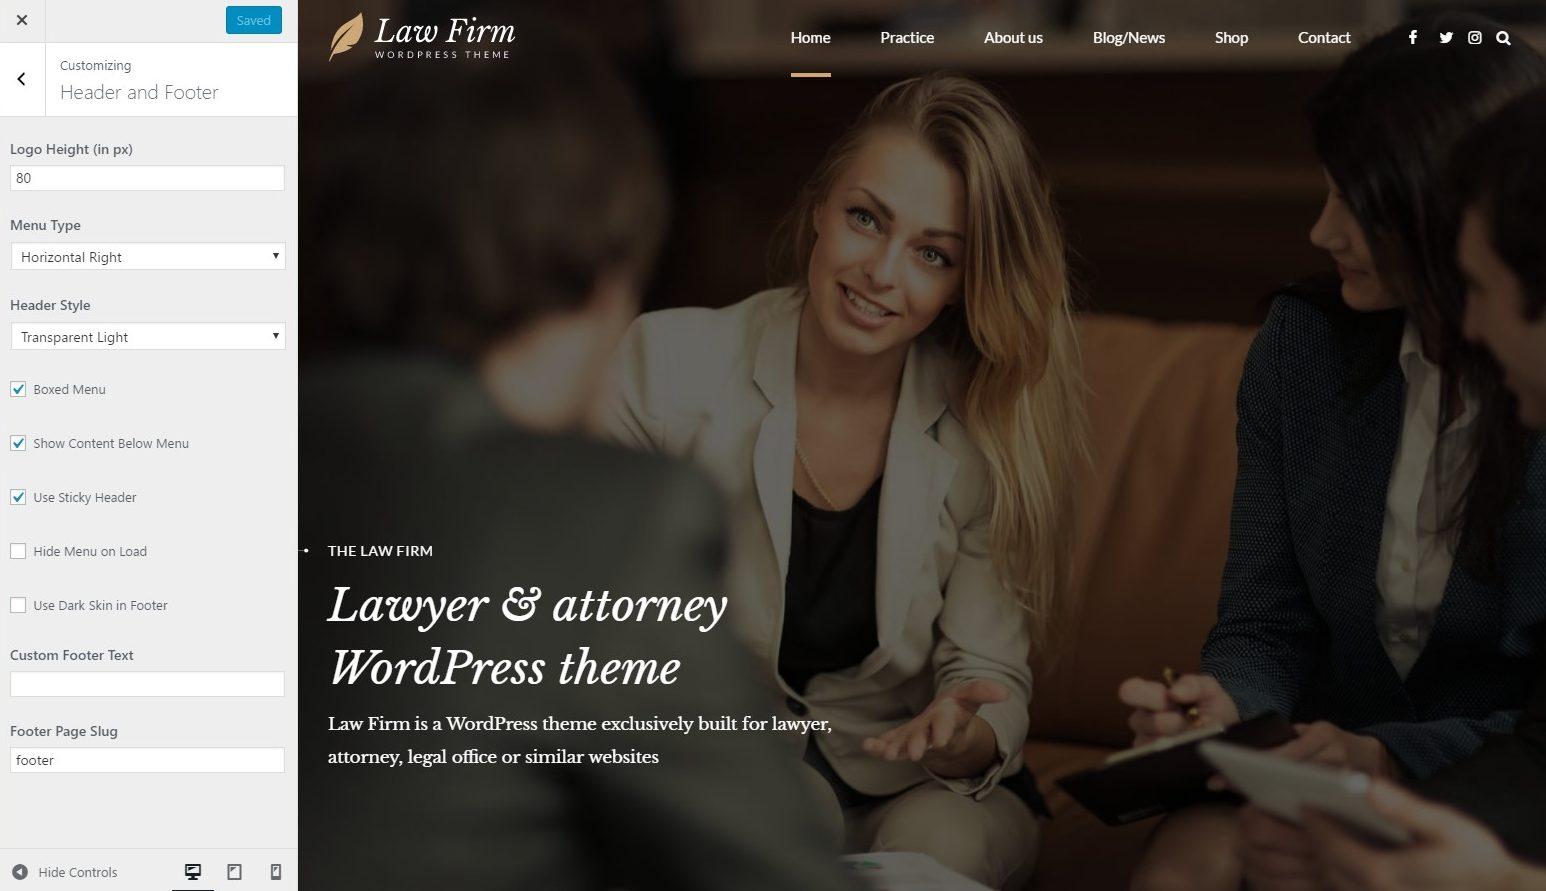 https://documentation.bold-themes.com/law-firm/wp-content/uploads/sites/15/2017/05/20-1-e1496309874345.jpg